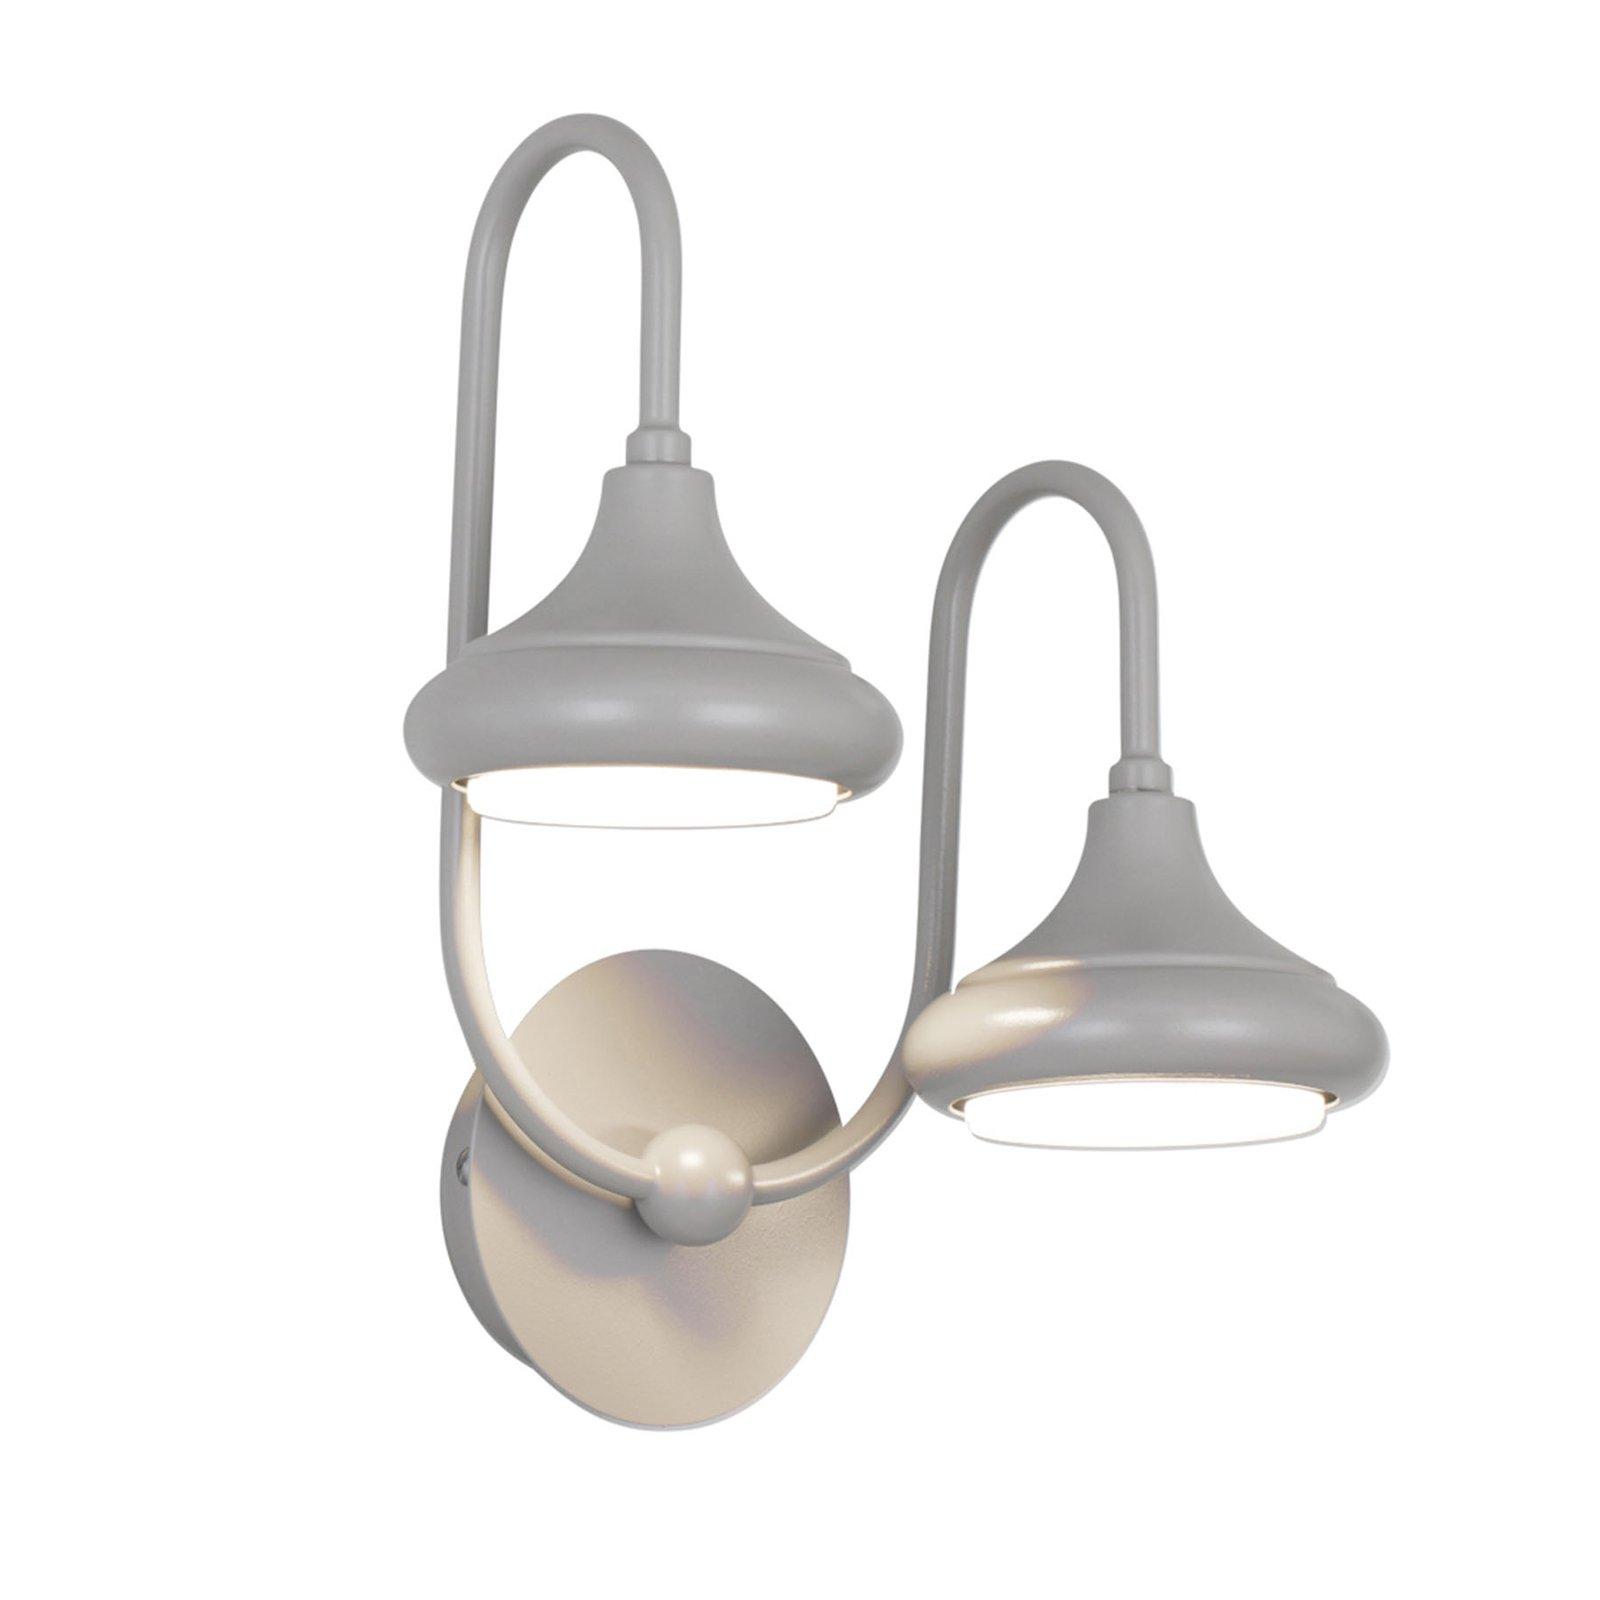 1680/2A vegglampe med 2 lyskilder, grå